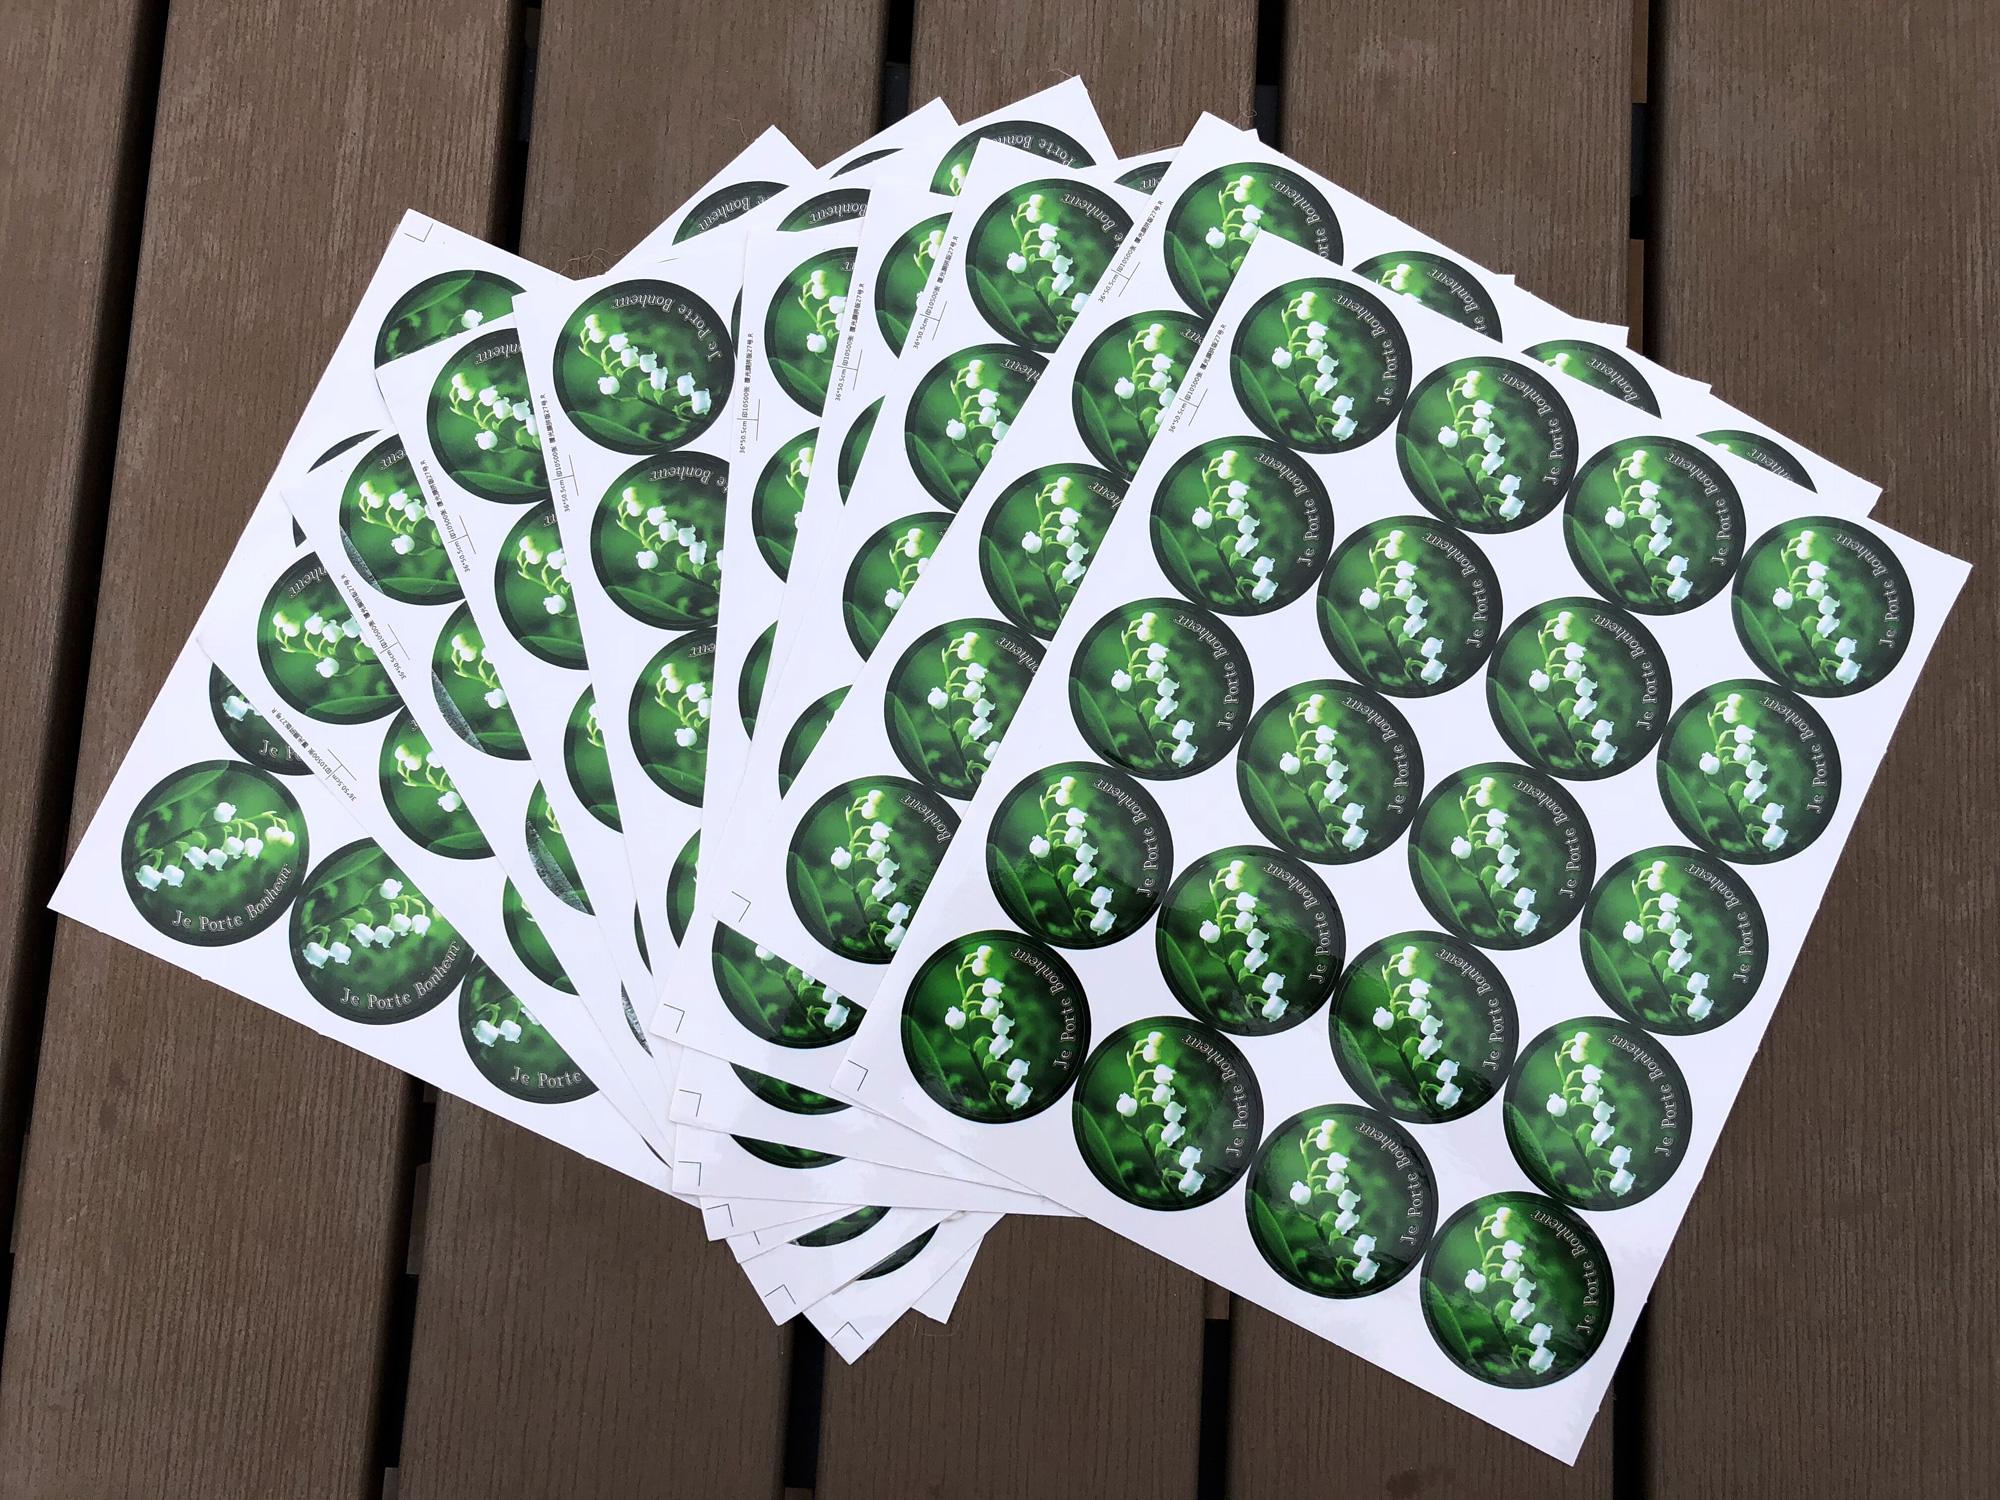 300 autocollants Stickers pour muguet 1er Mai DMA1